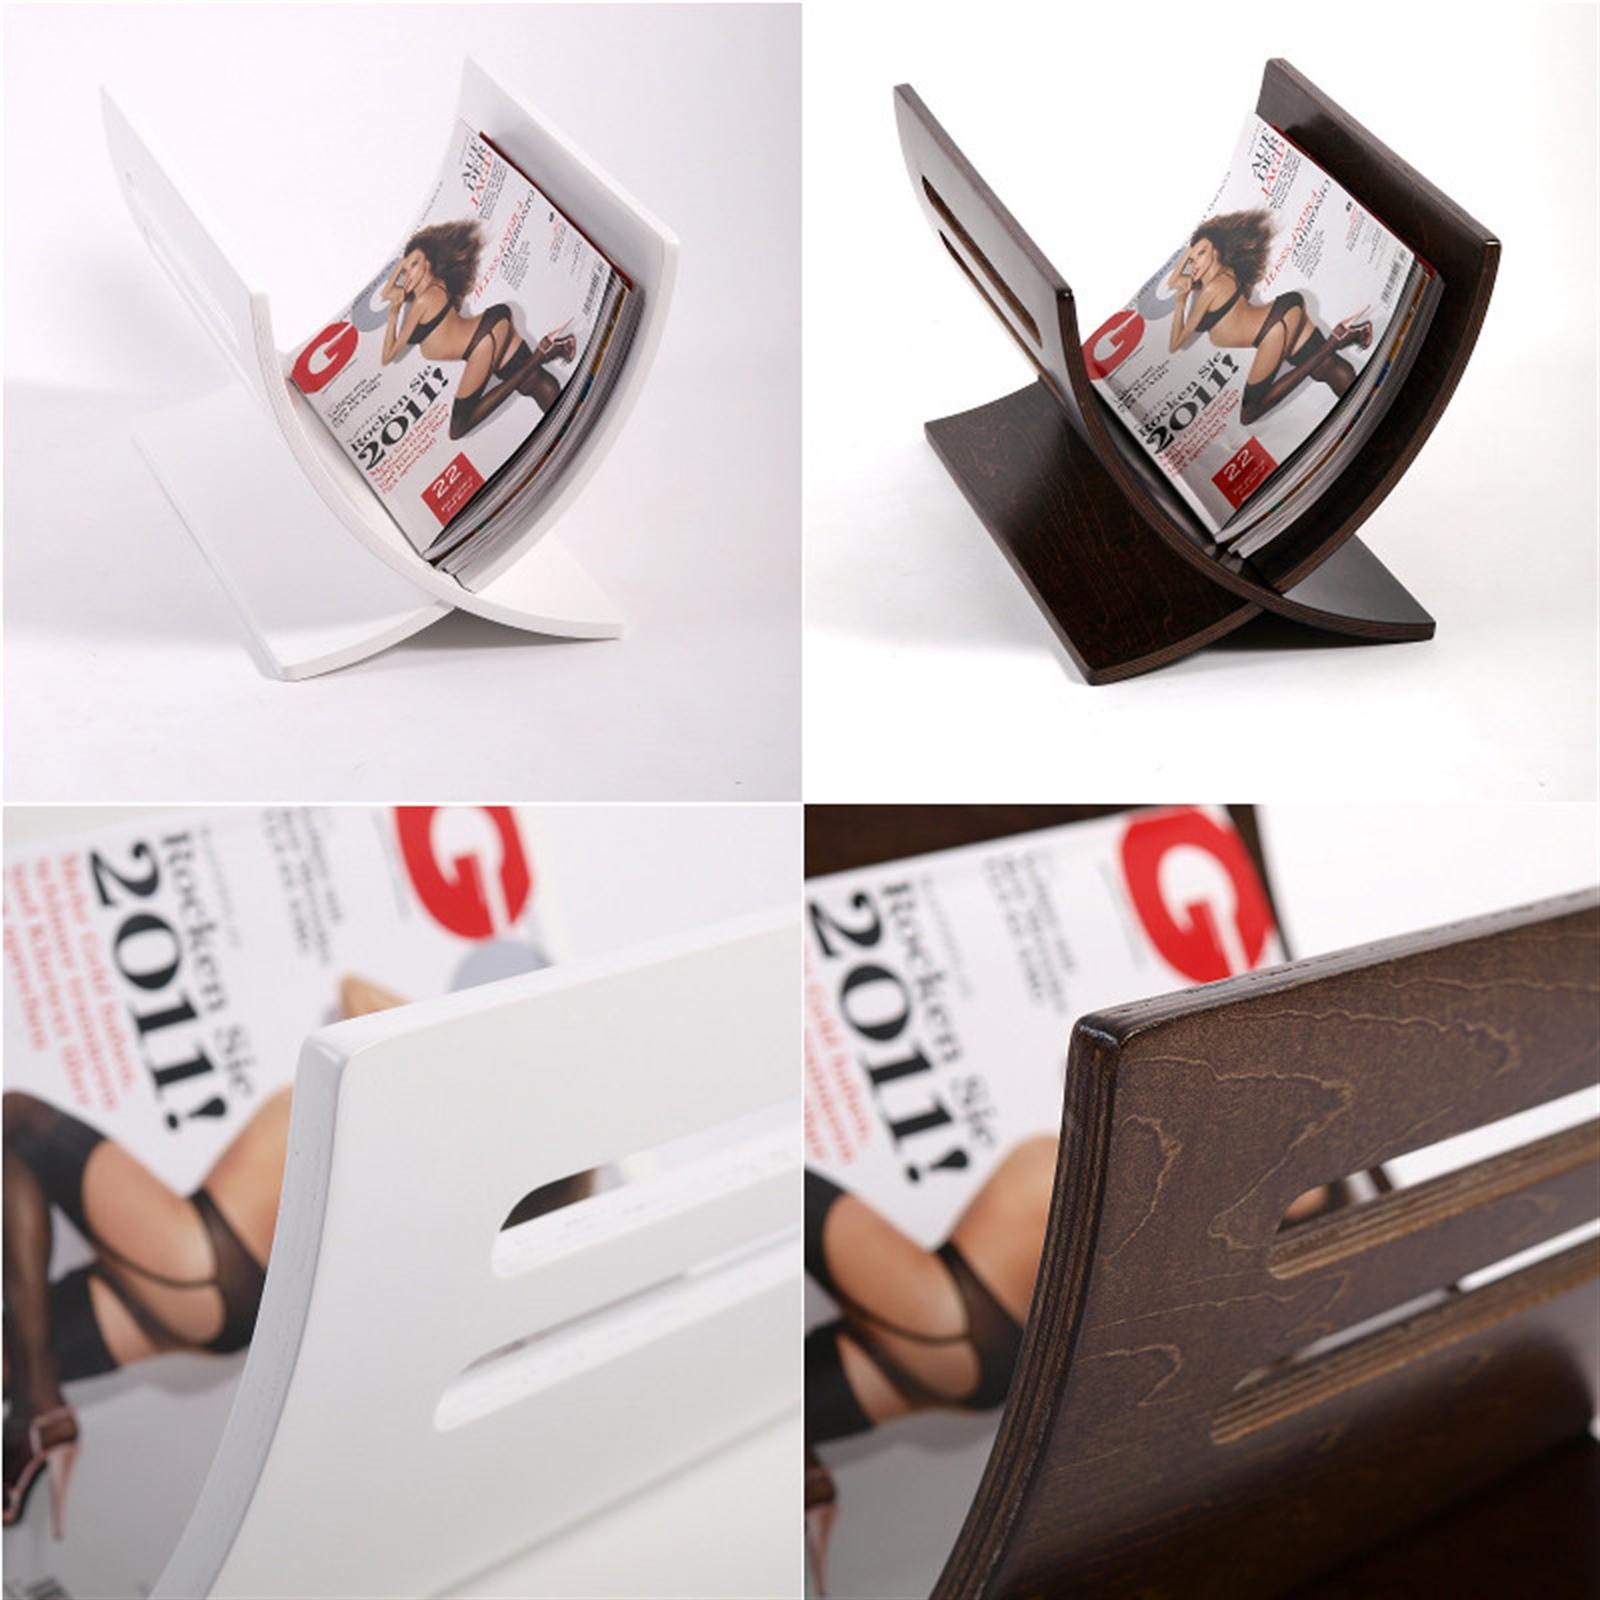 design zeitungsst nder news wenge holz zeitungskorb. Black Bedroom Furniture Sets. Home Design Ideas